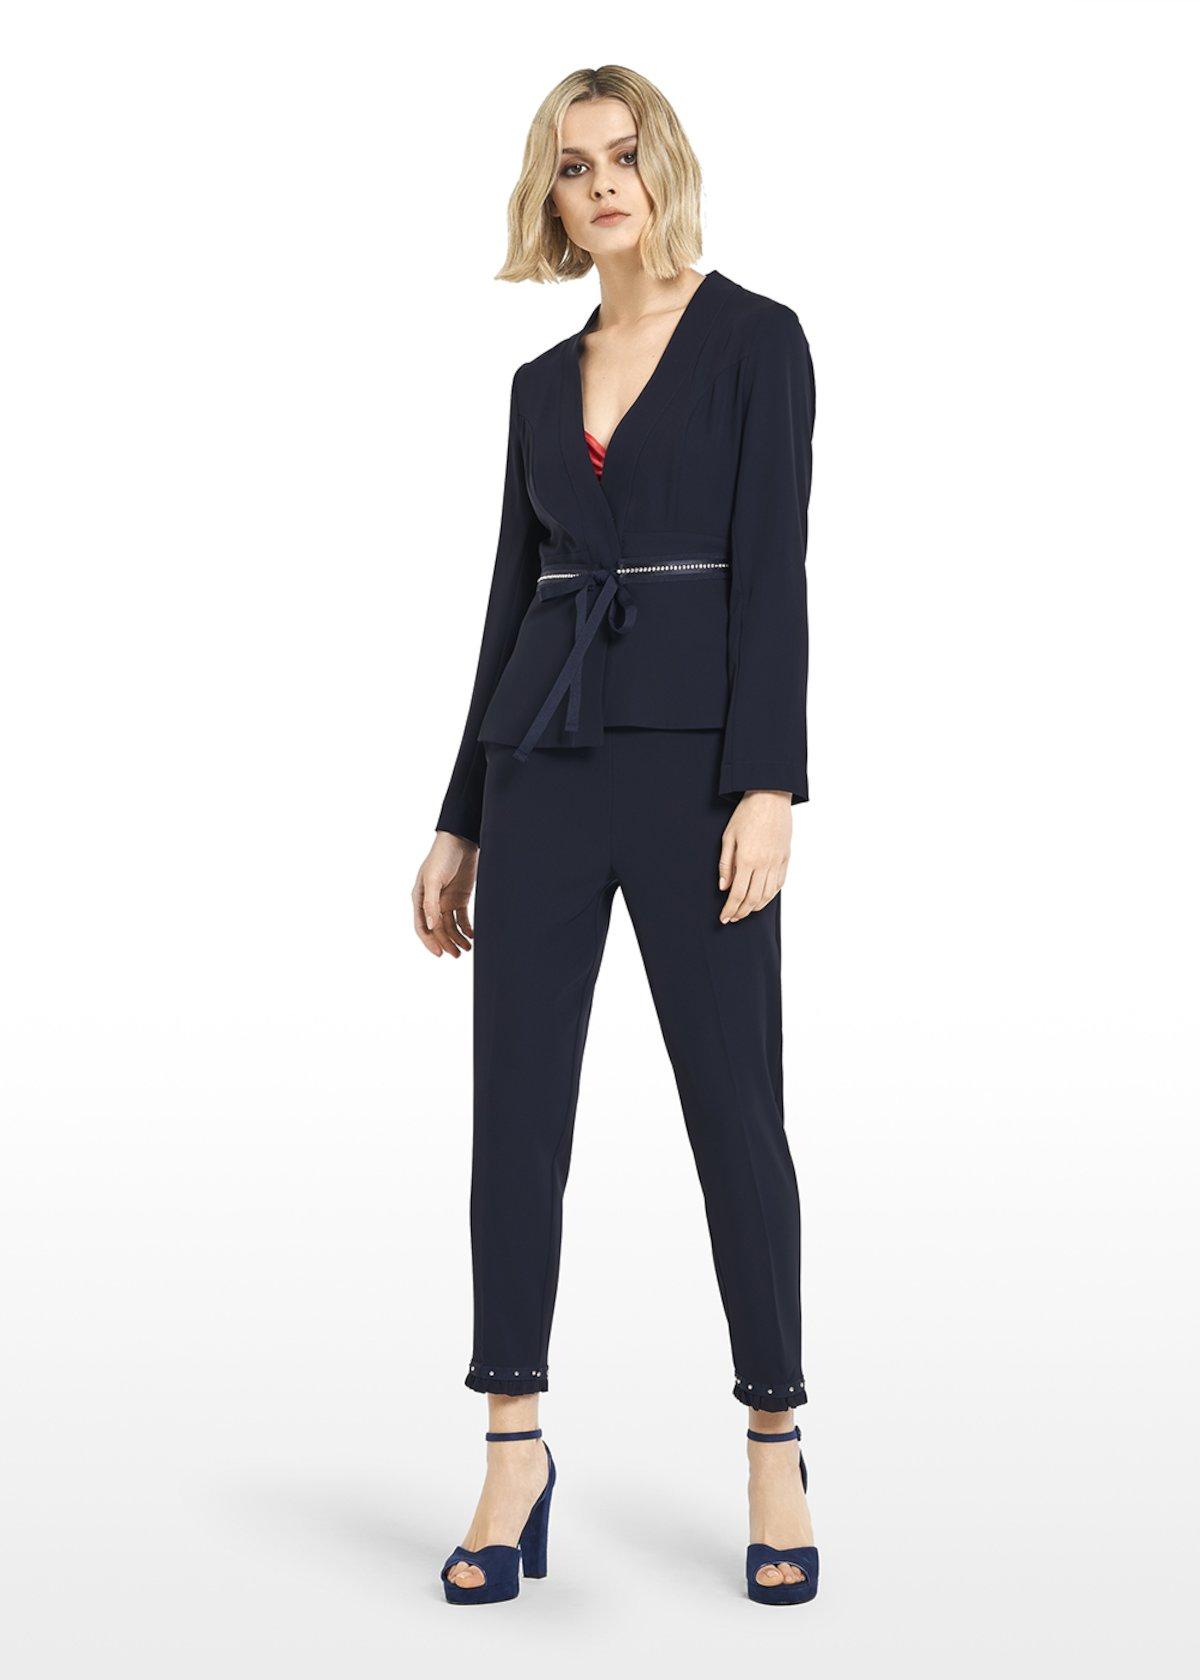 Gilda jacket cadi fabric with removable belt - Medium Blue - Woman